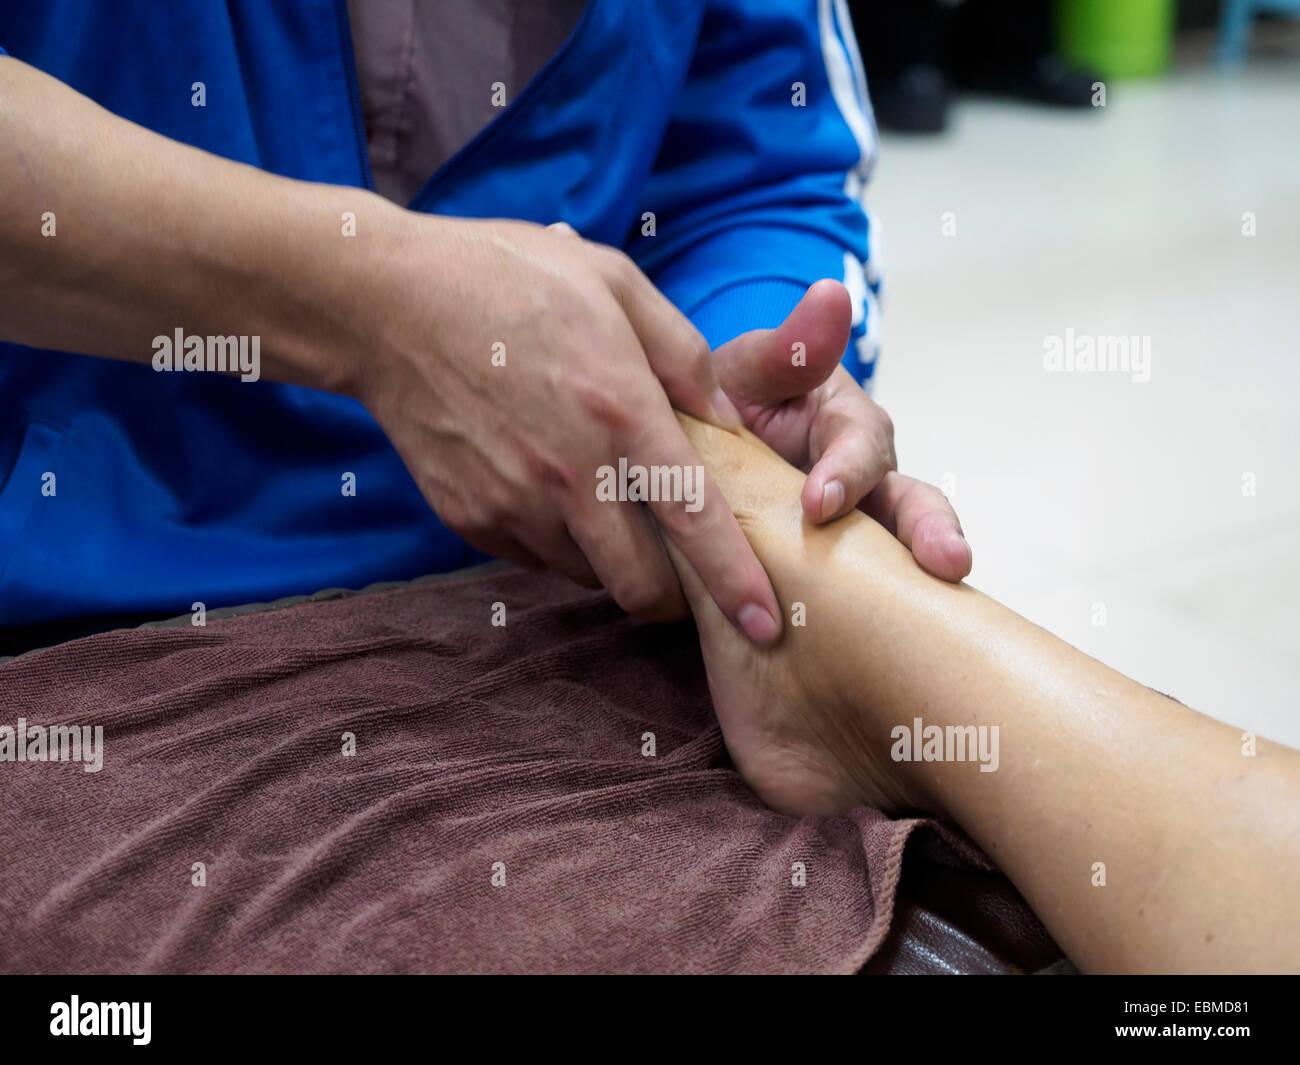 Foot massage - Stock Image